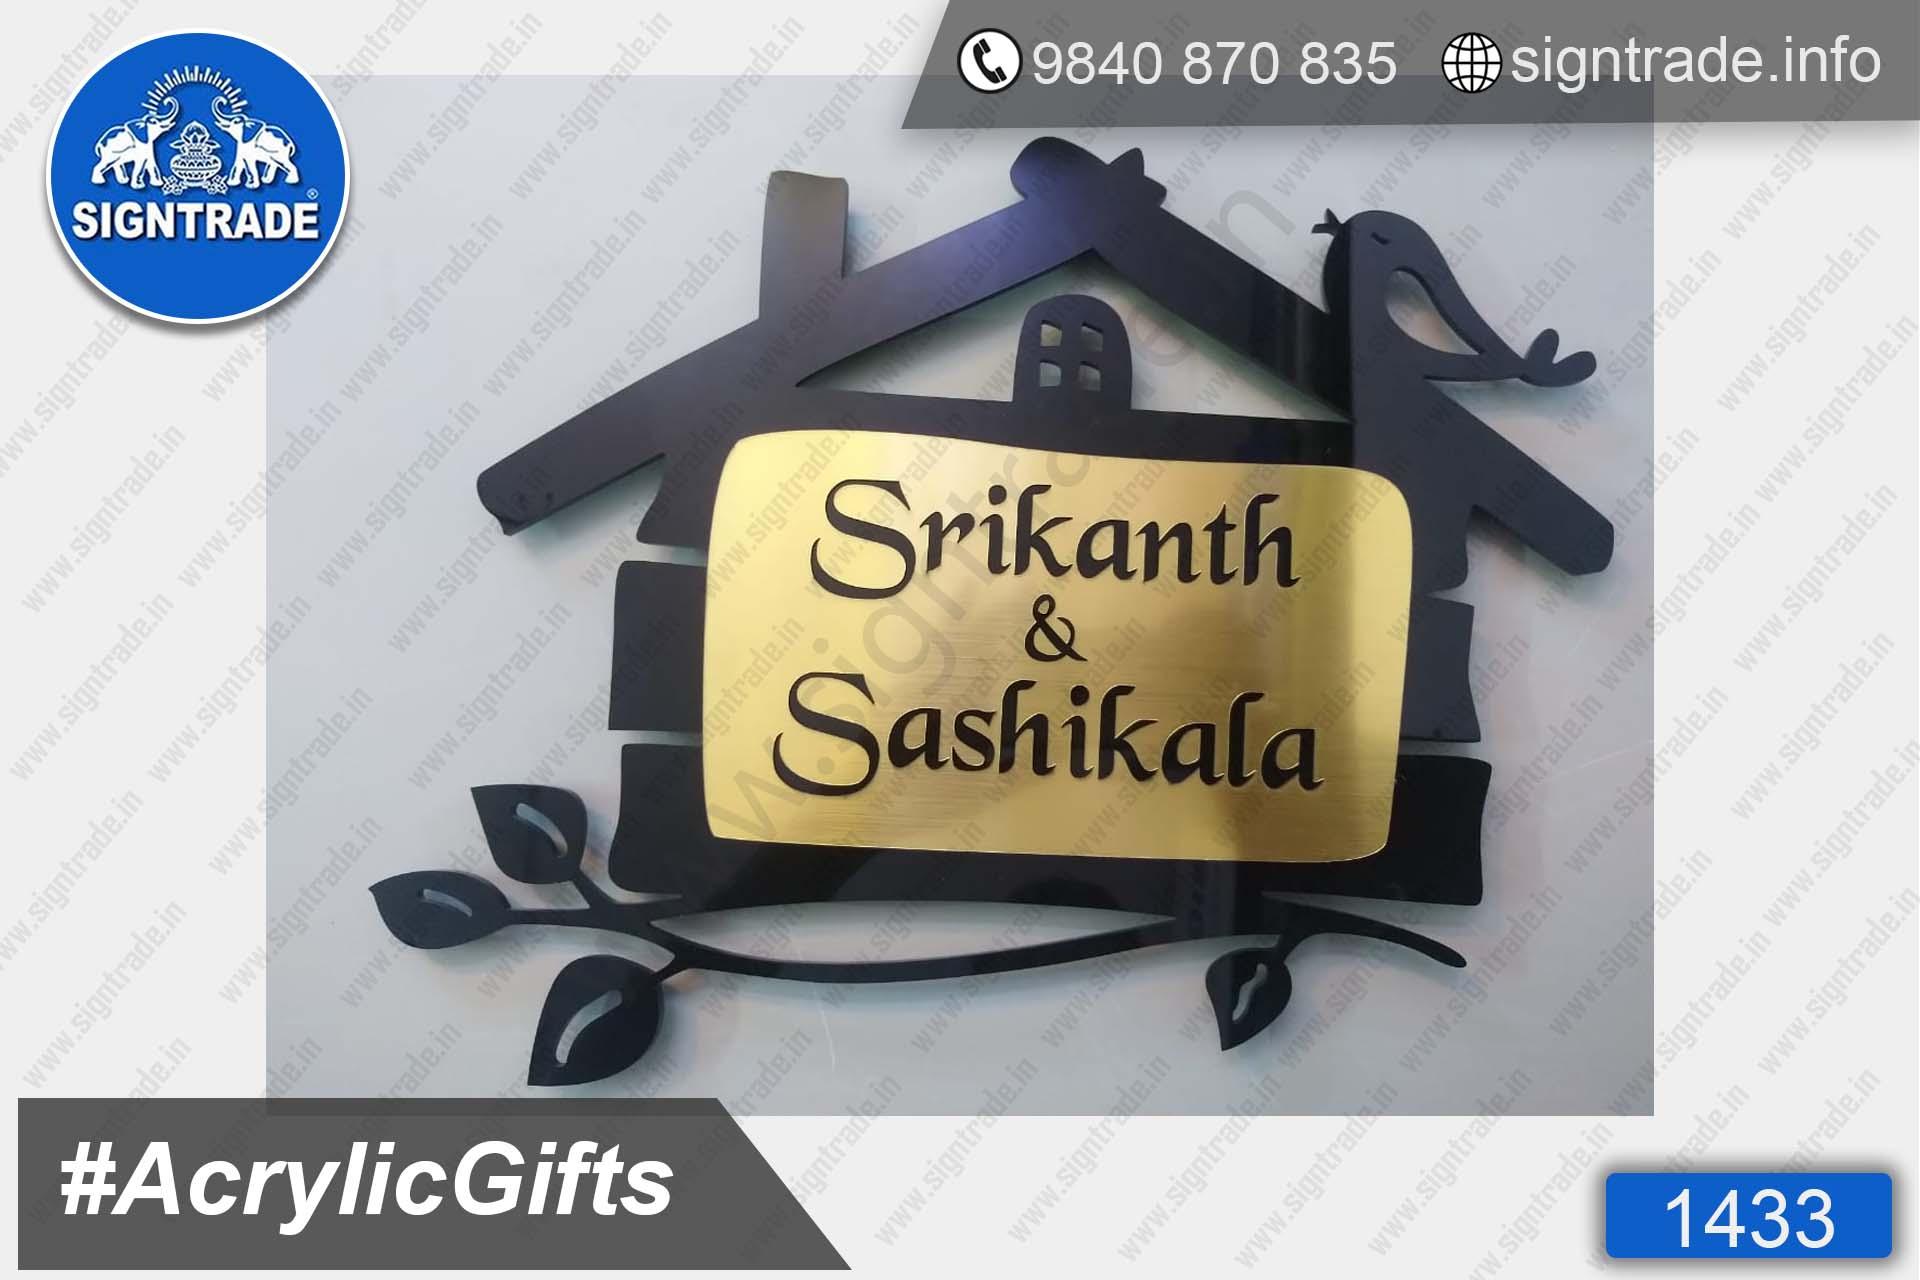 1433, Personalized Acrylic Name Gift, Acrylic Name Plate, Acrylic Name Gift